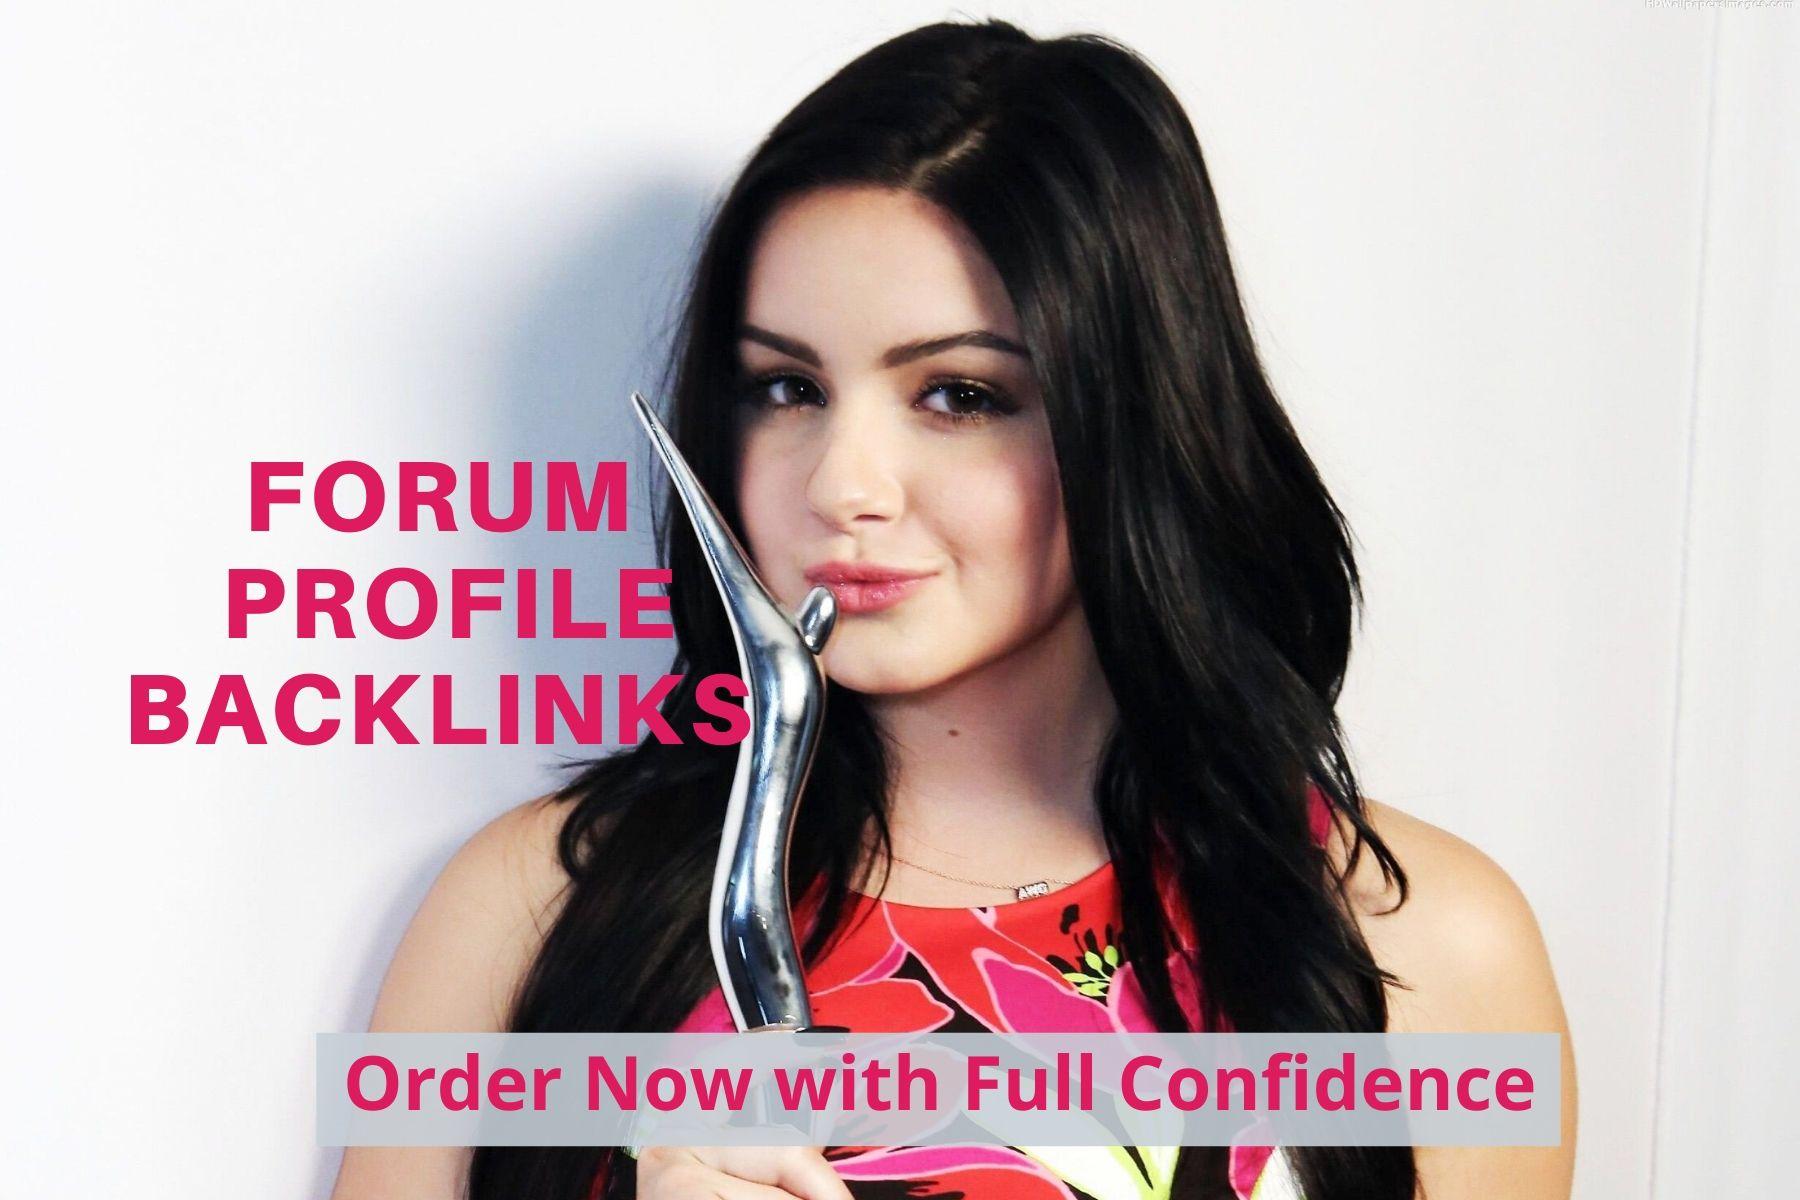 do manually create 500+ forums Profile SEO high authority backlinks for Google ranking